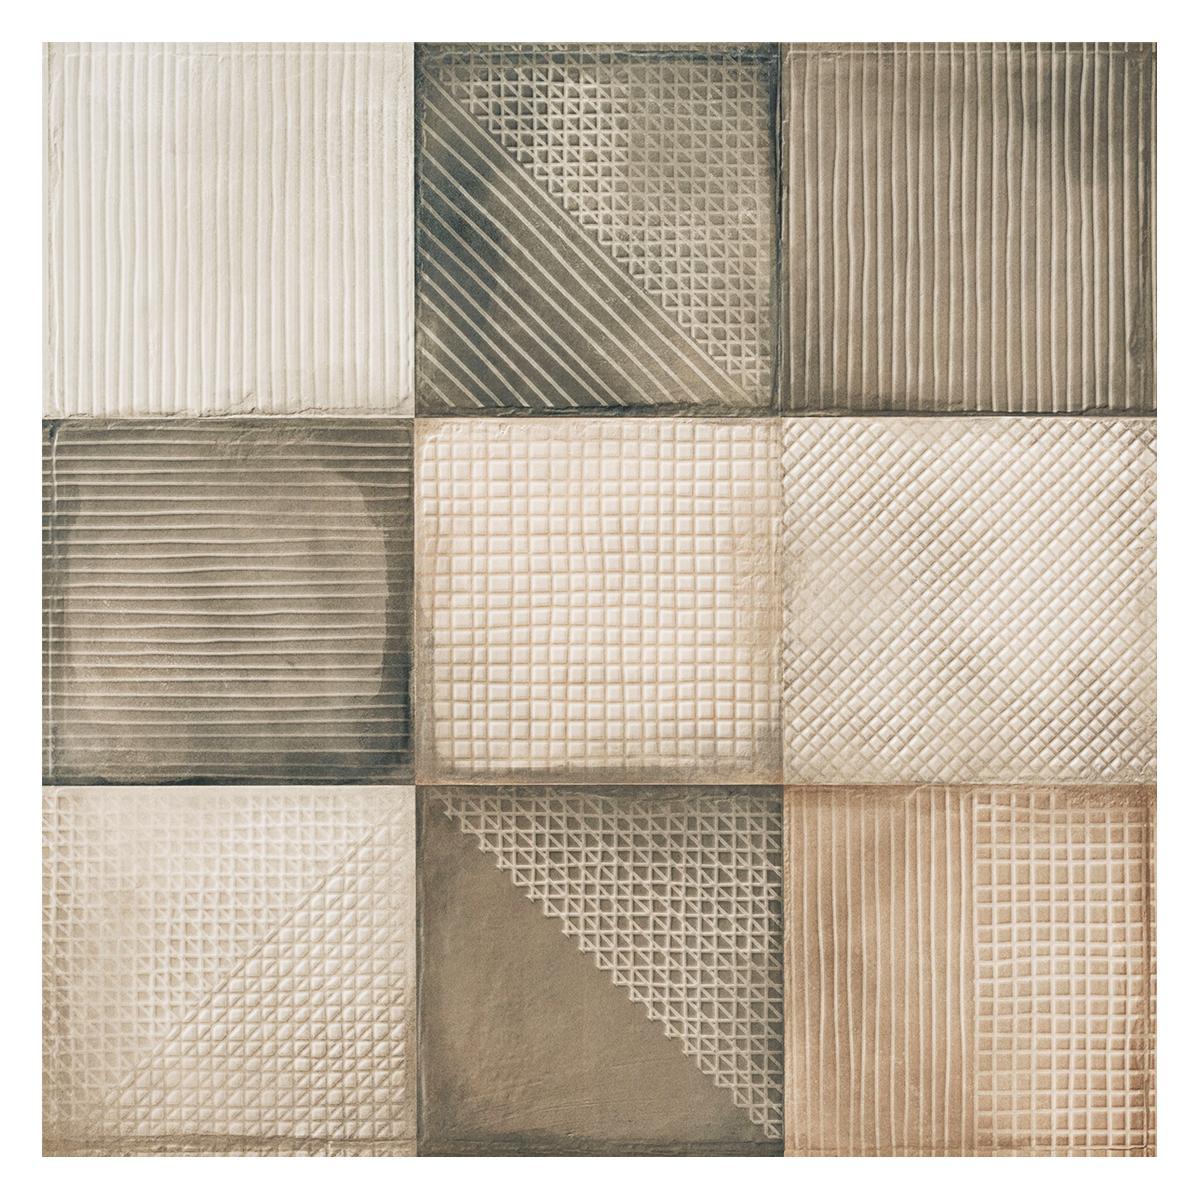 Porcelanato Rio Beige Mate - 59X59 cm - 1.39 m2